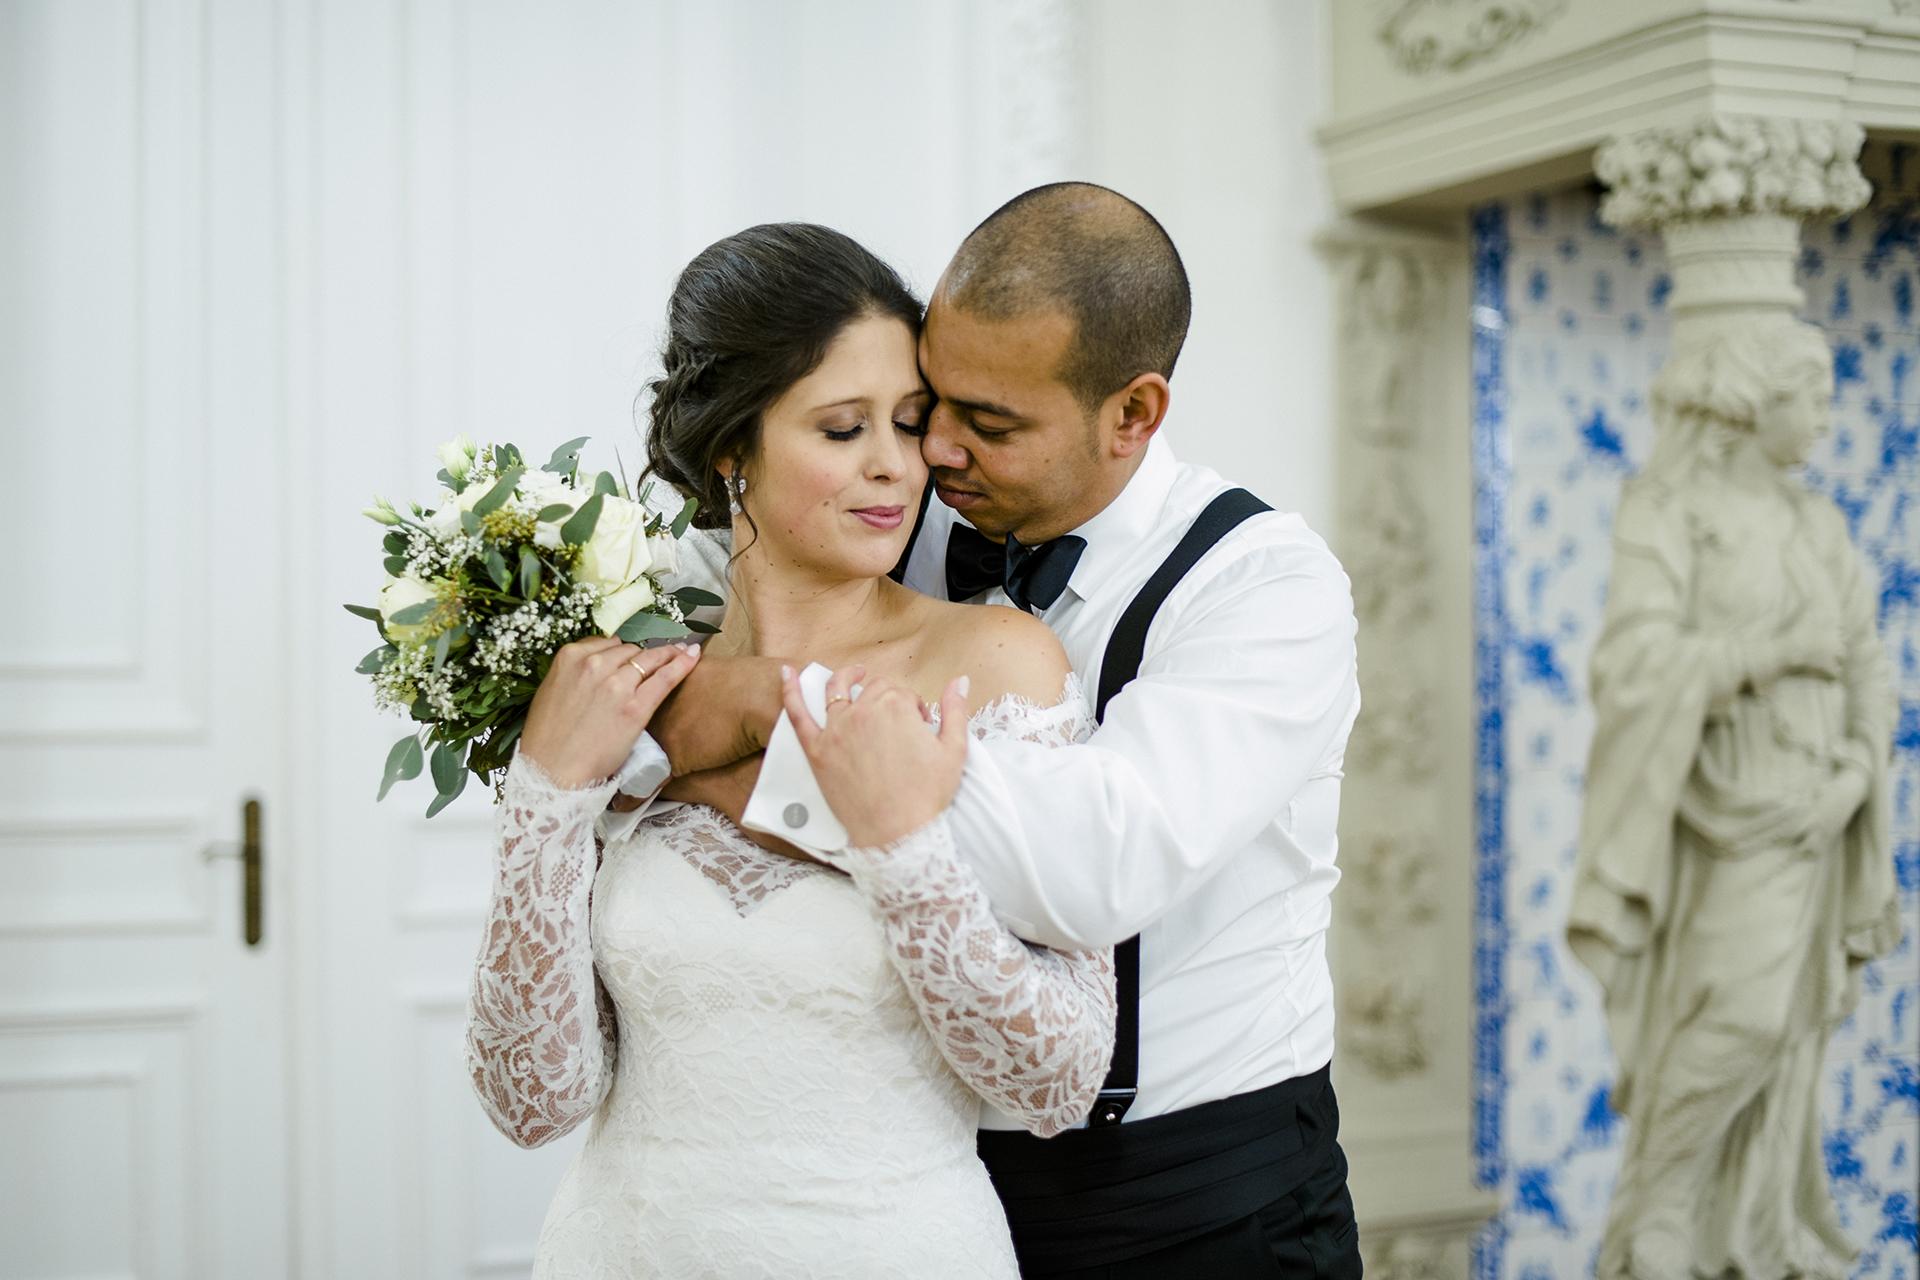 Hochzeitsreportage_J&D_051_Caroline Queda Fotografie